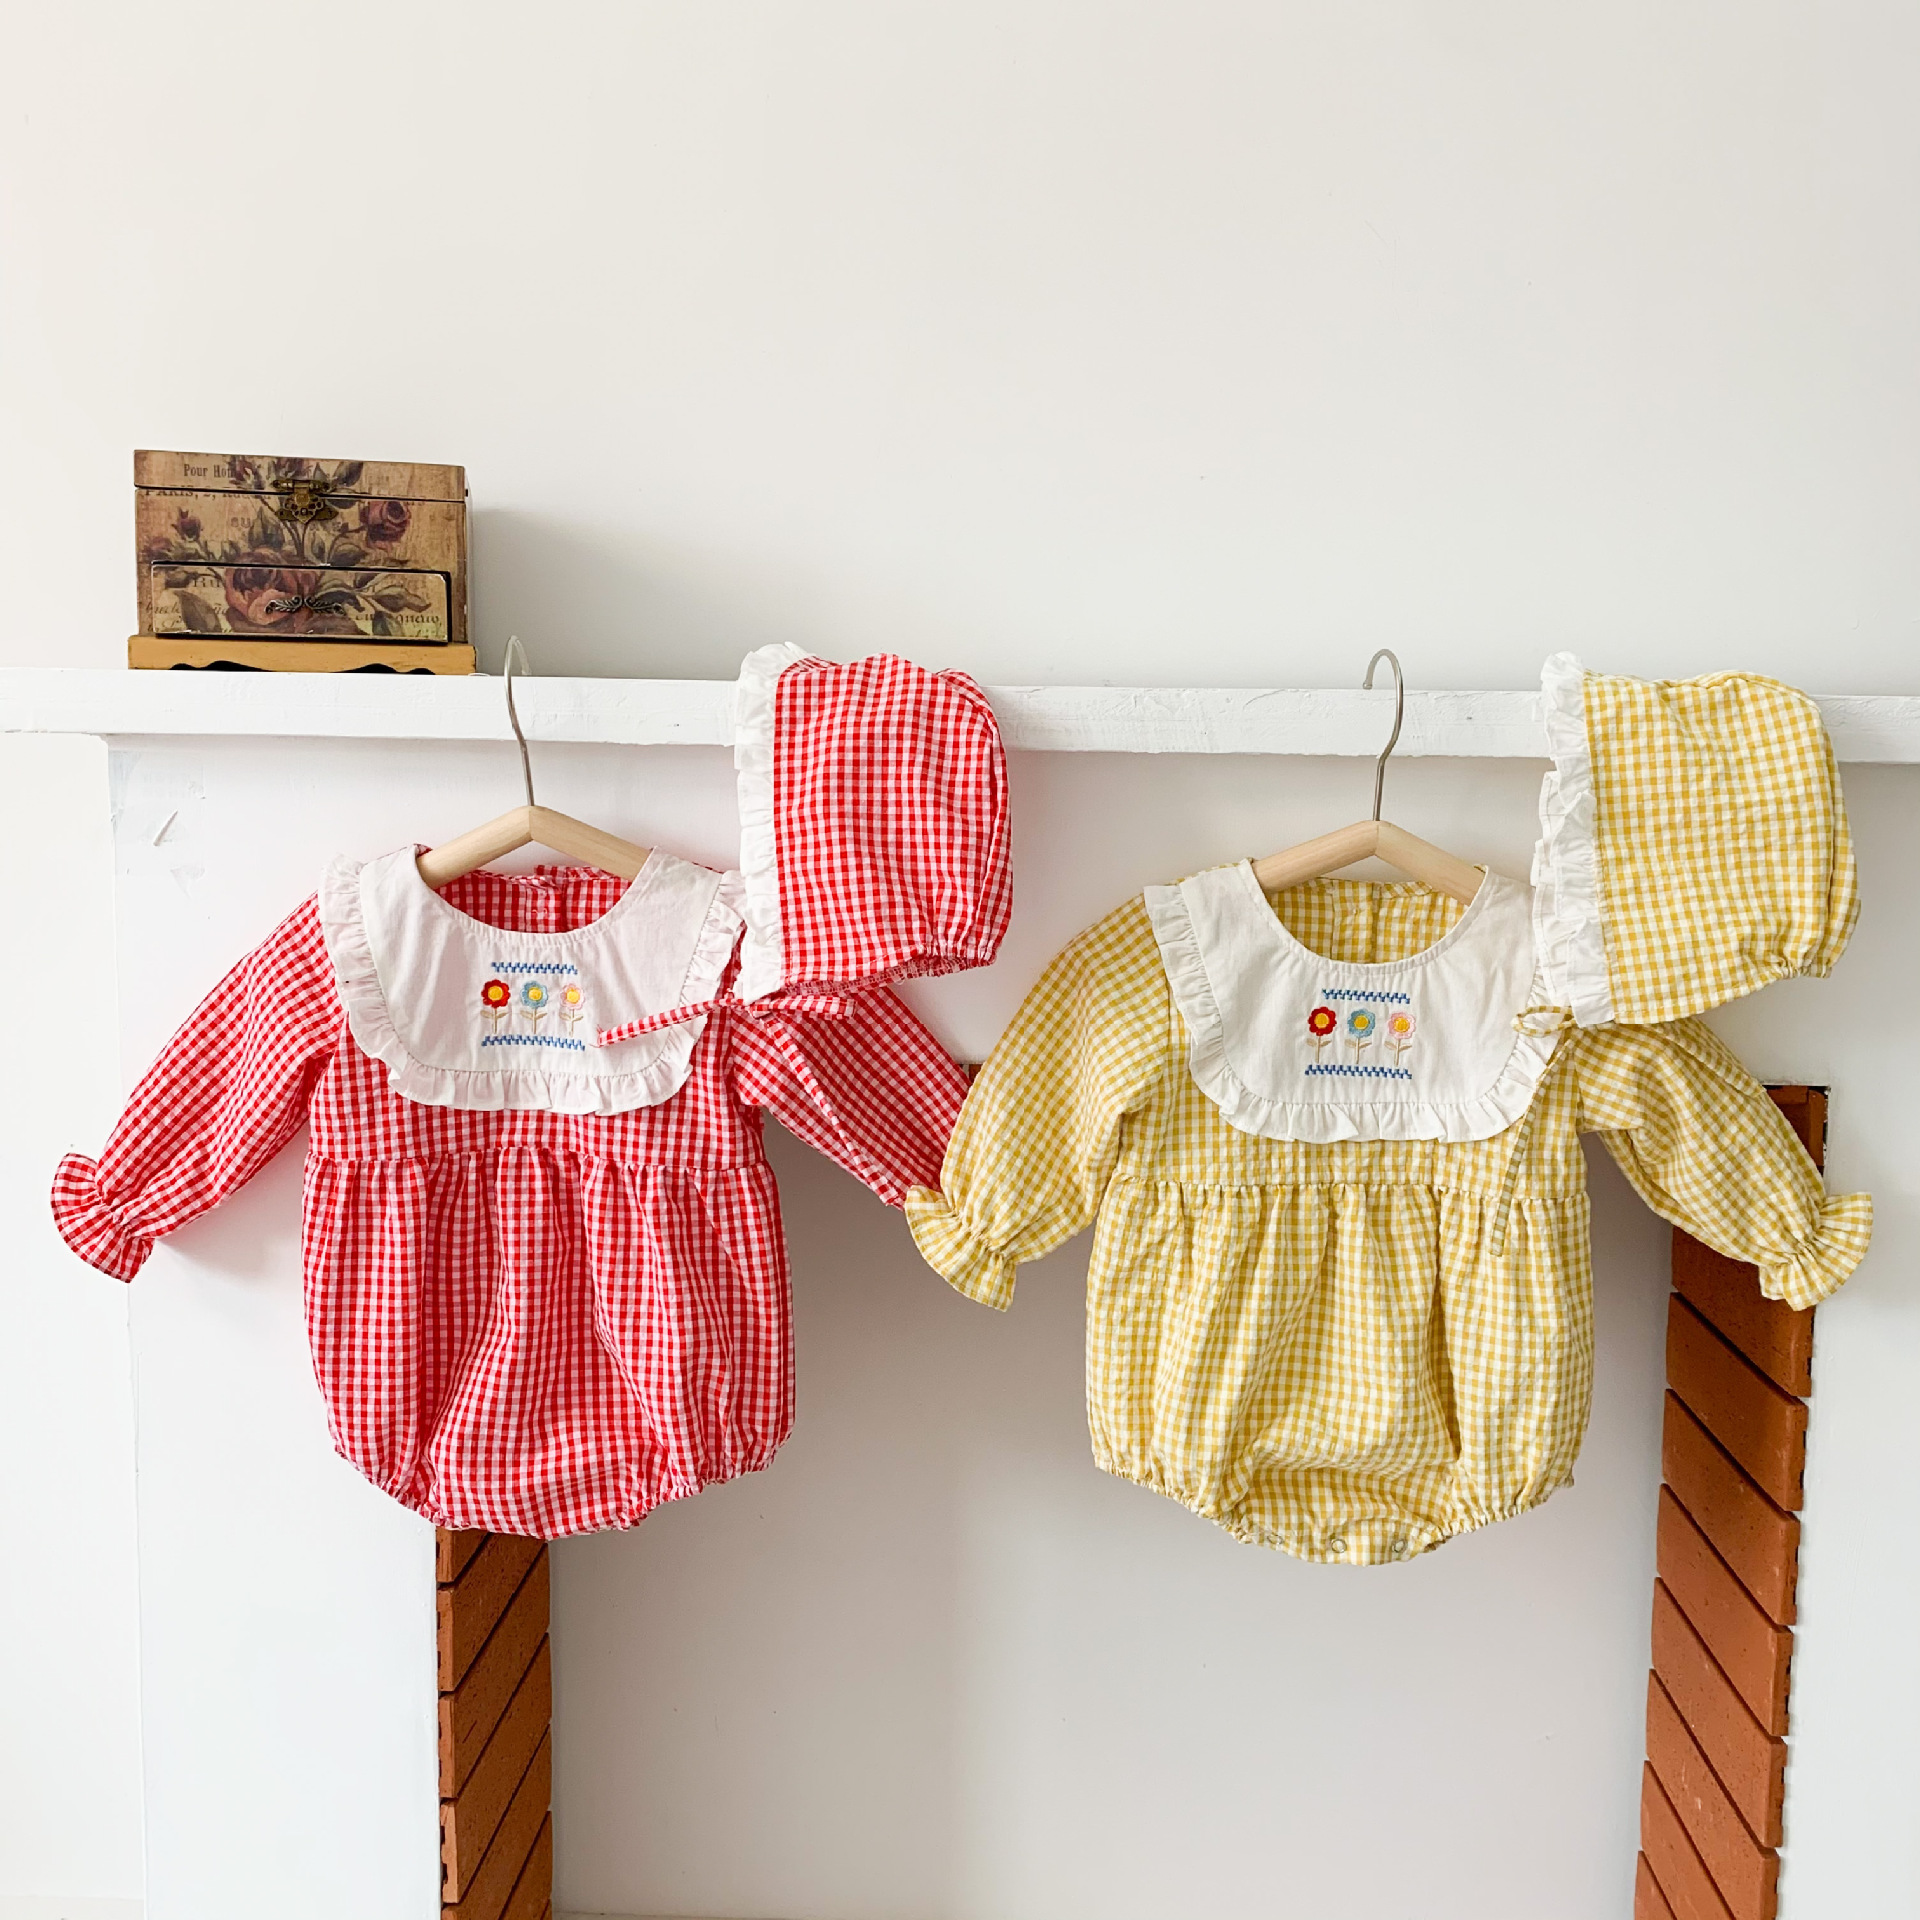 2021 ins nova moda bebe macacao meninas 01